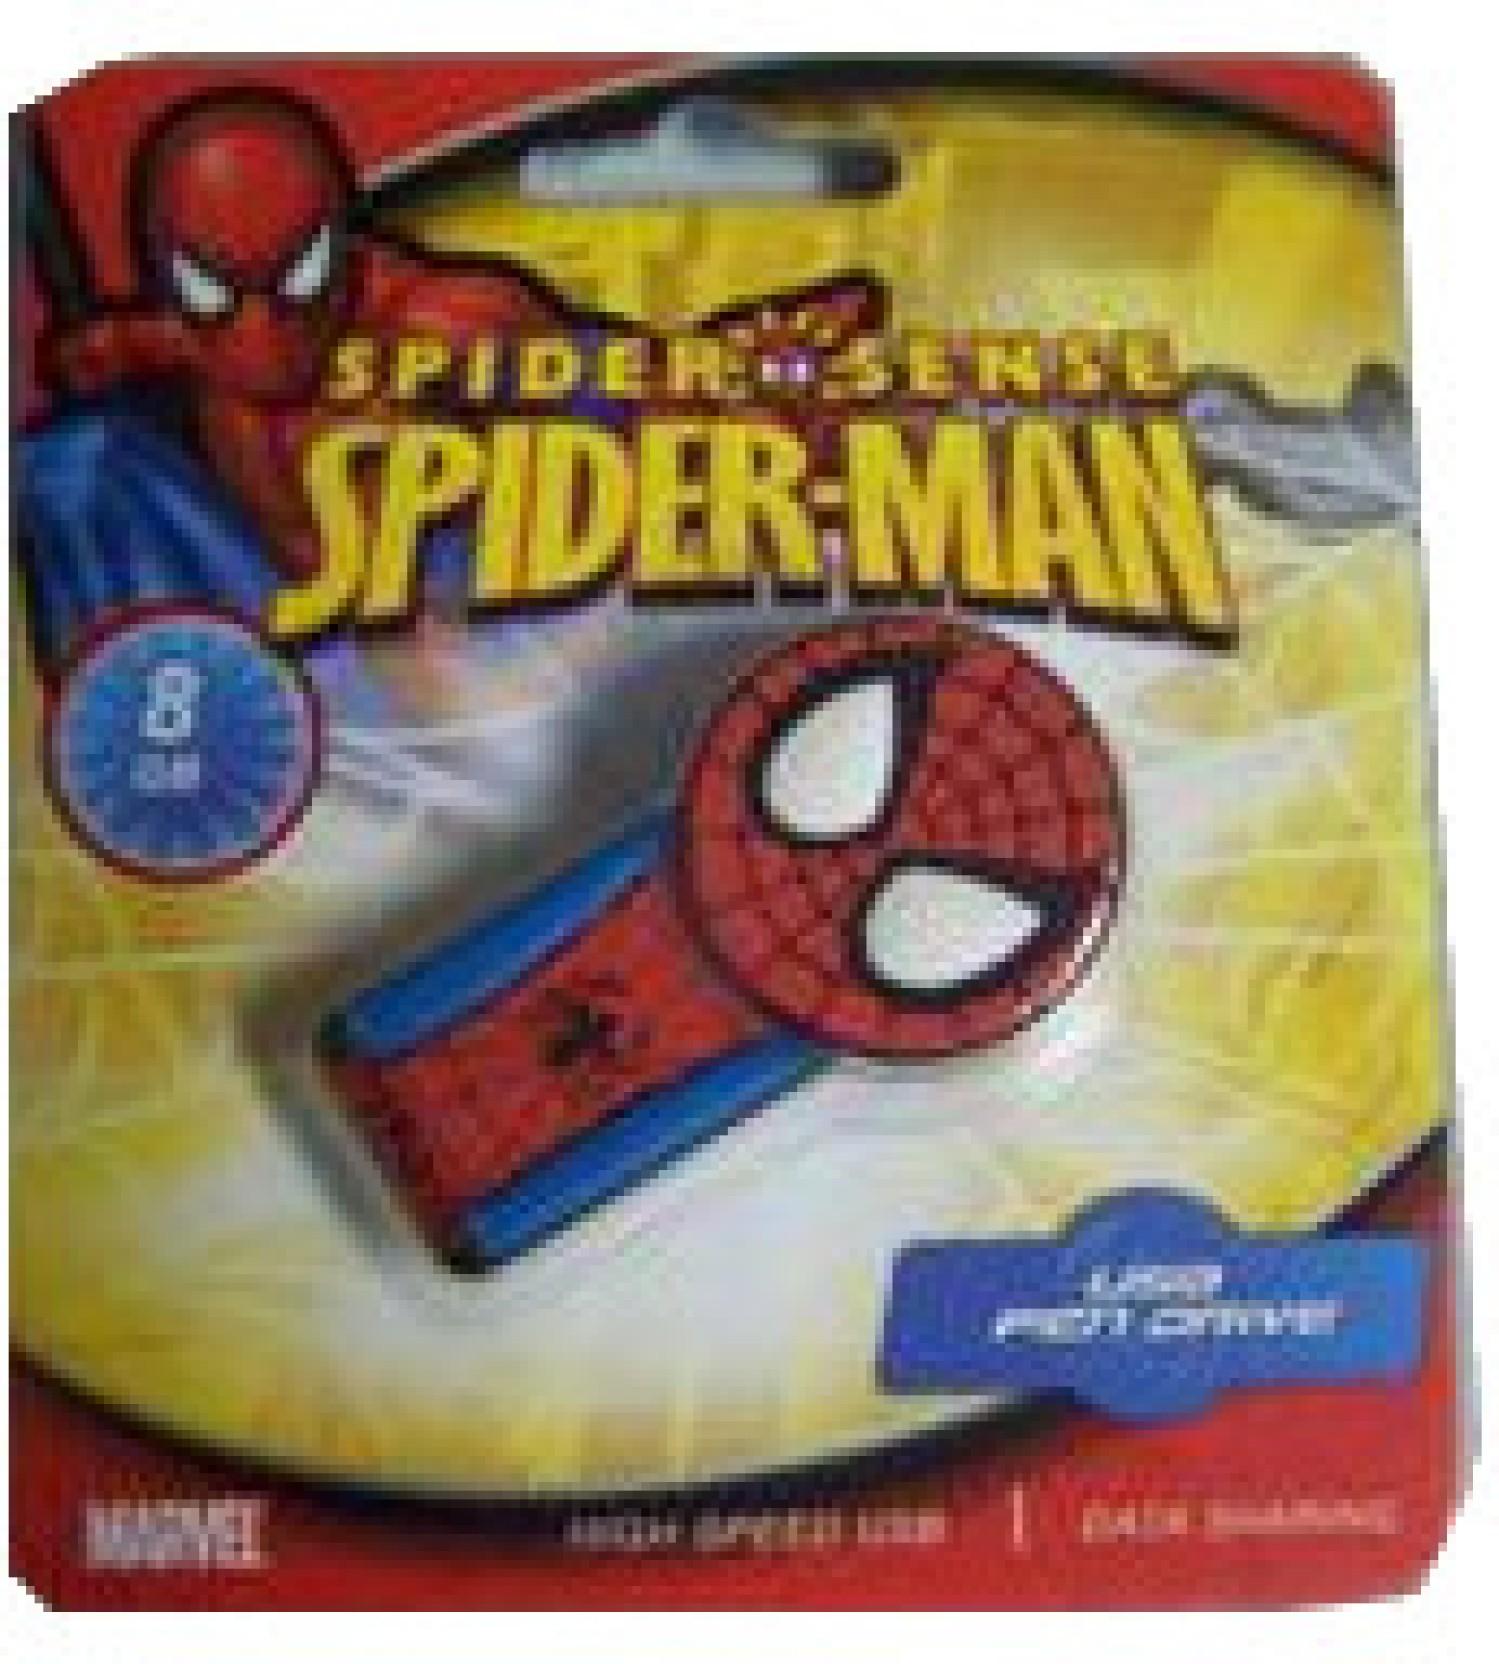 marvel spiderman pen drive 8 gb 8 gb pen drive marvel